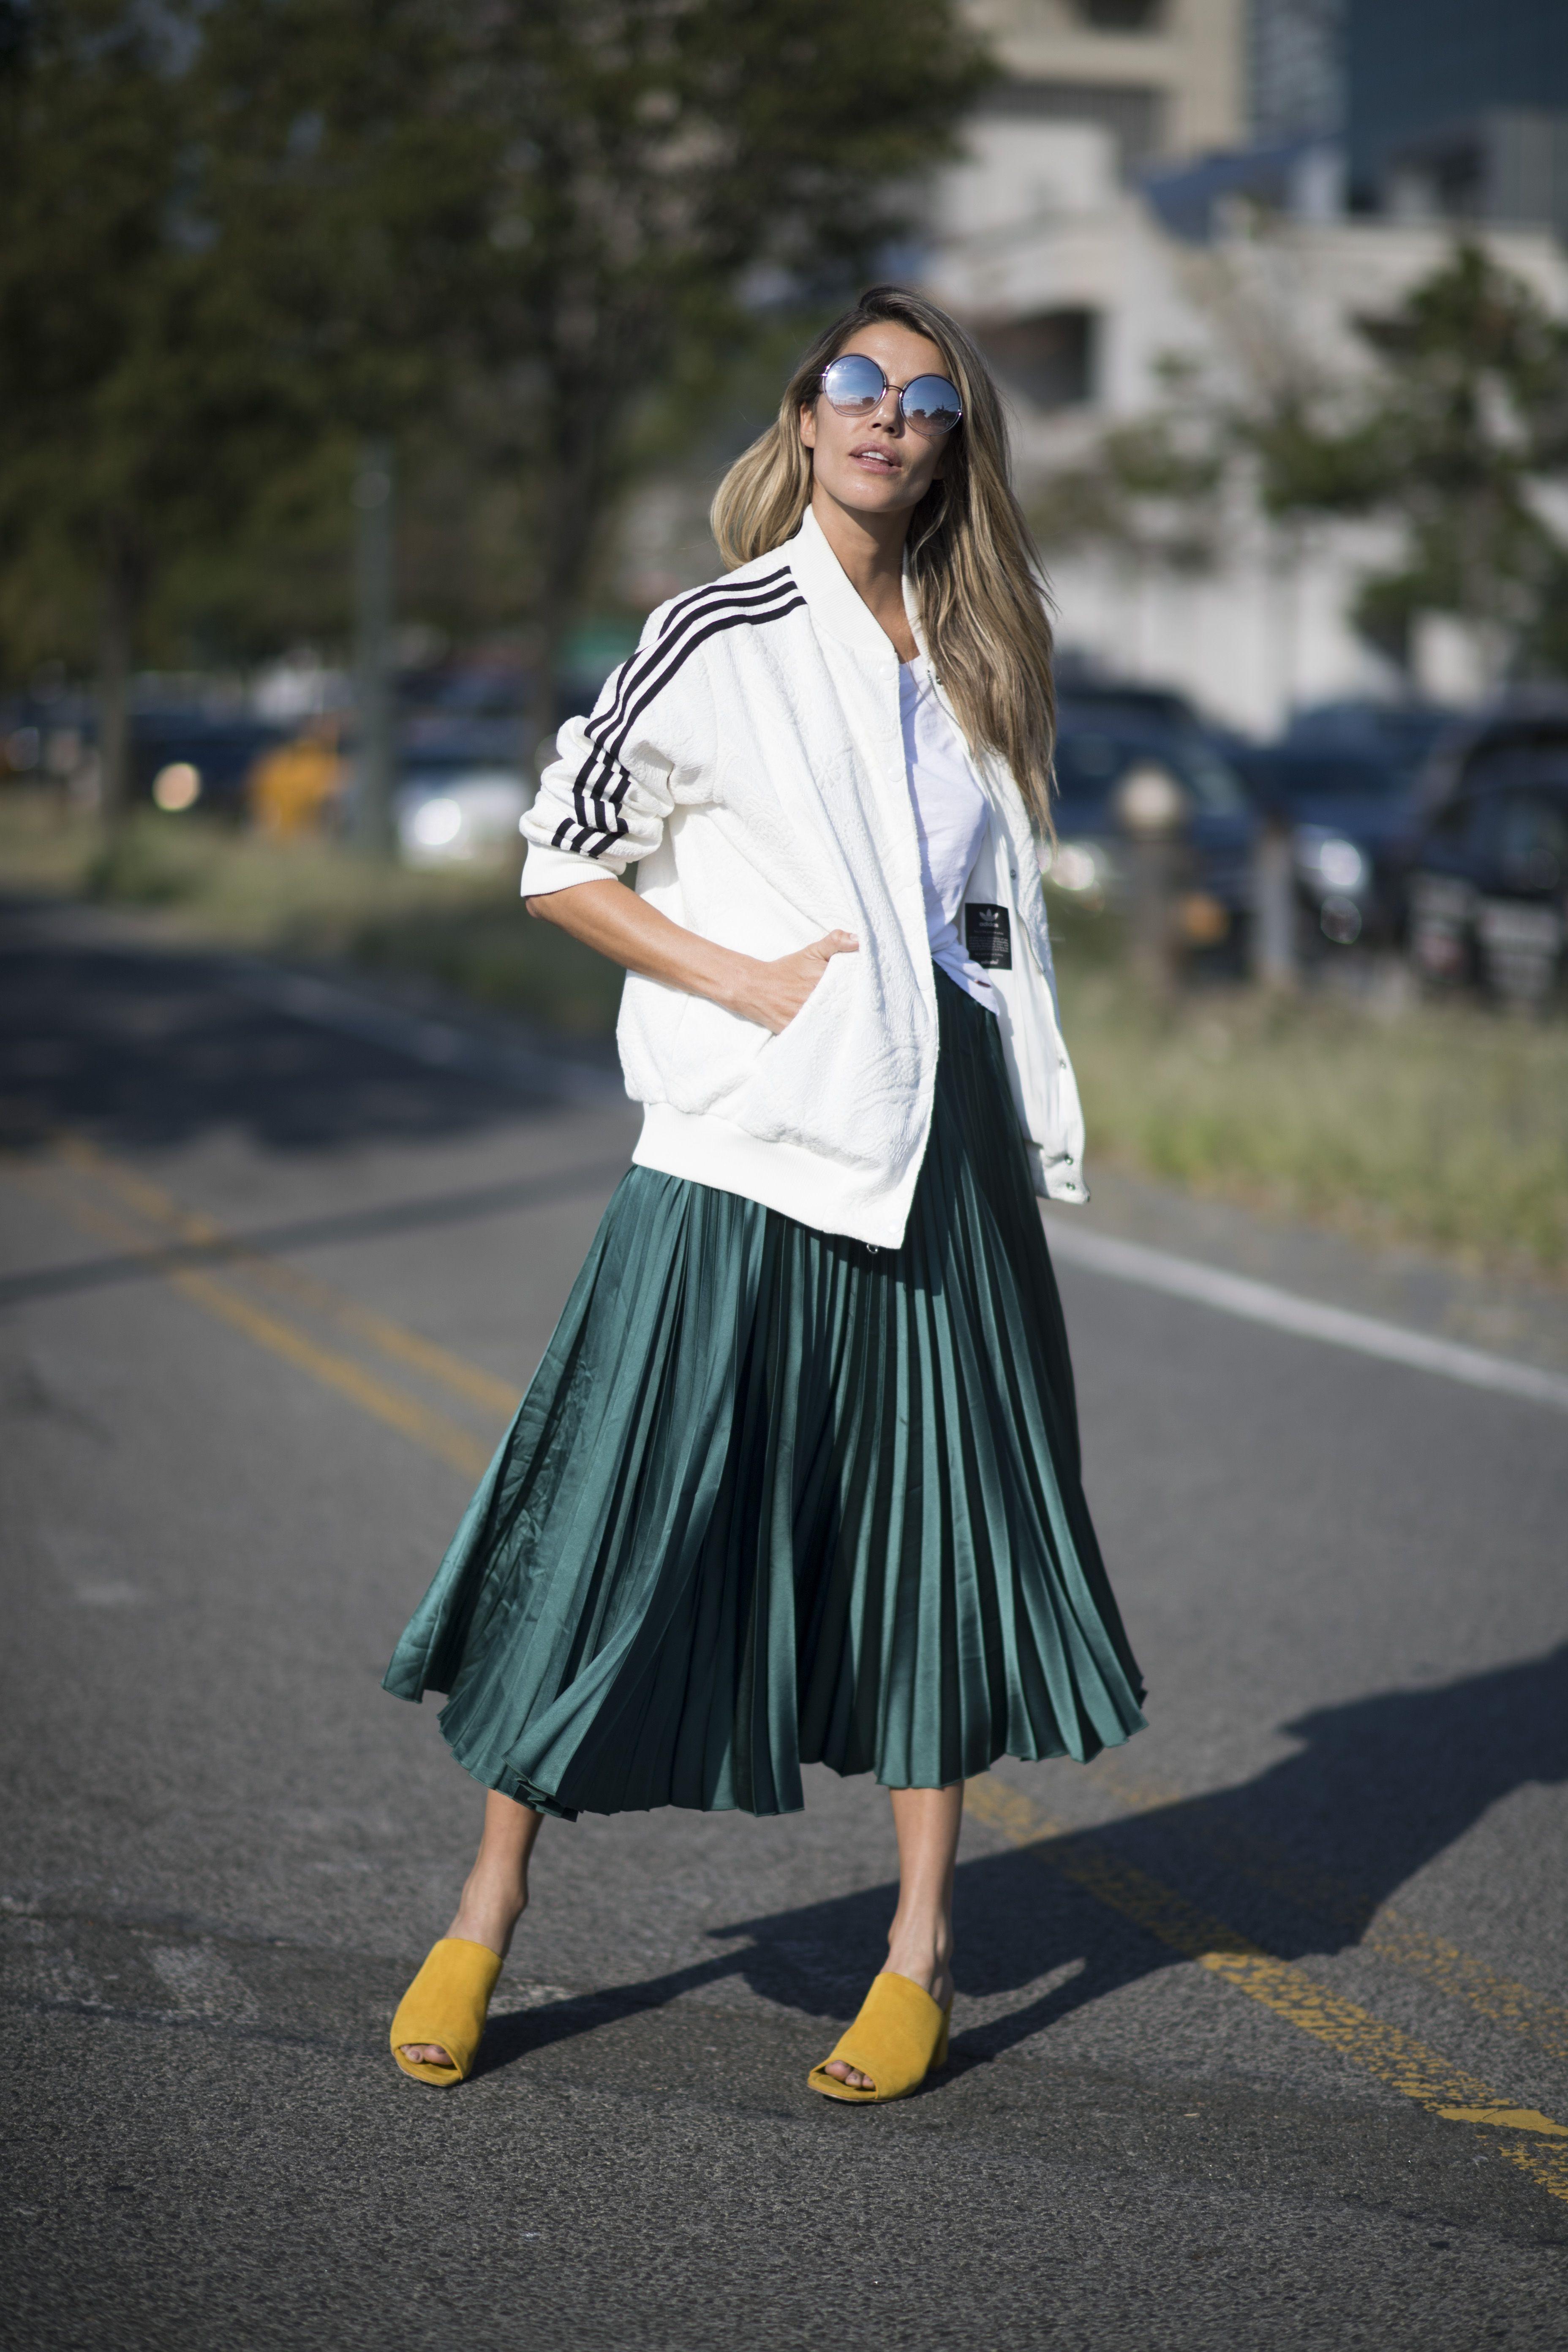 <p>象徵優雅、浪漫的百褶裙,不妨試試穿上運動外套,強烈的氛圍對比,似乎也別有一番風情。</p>